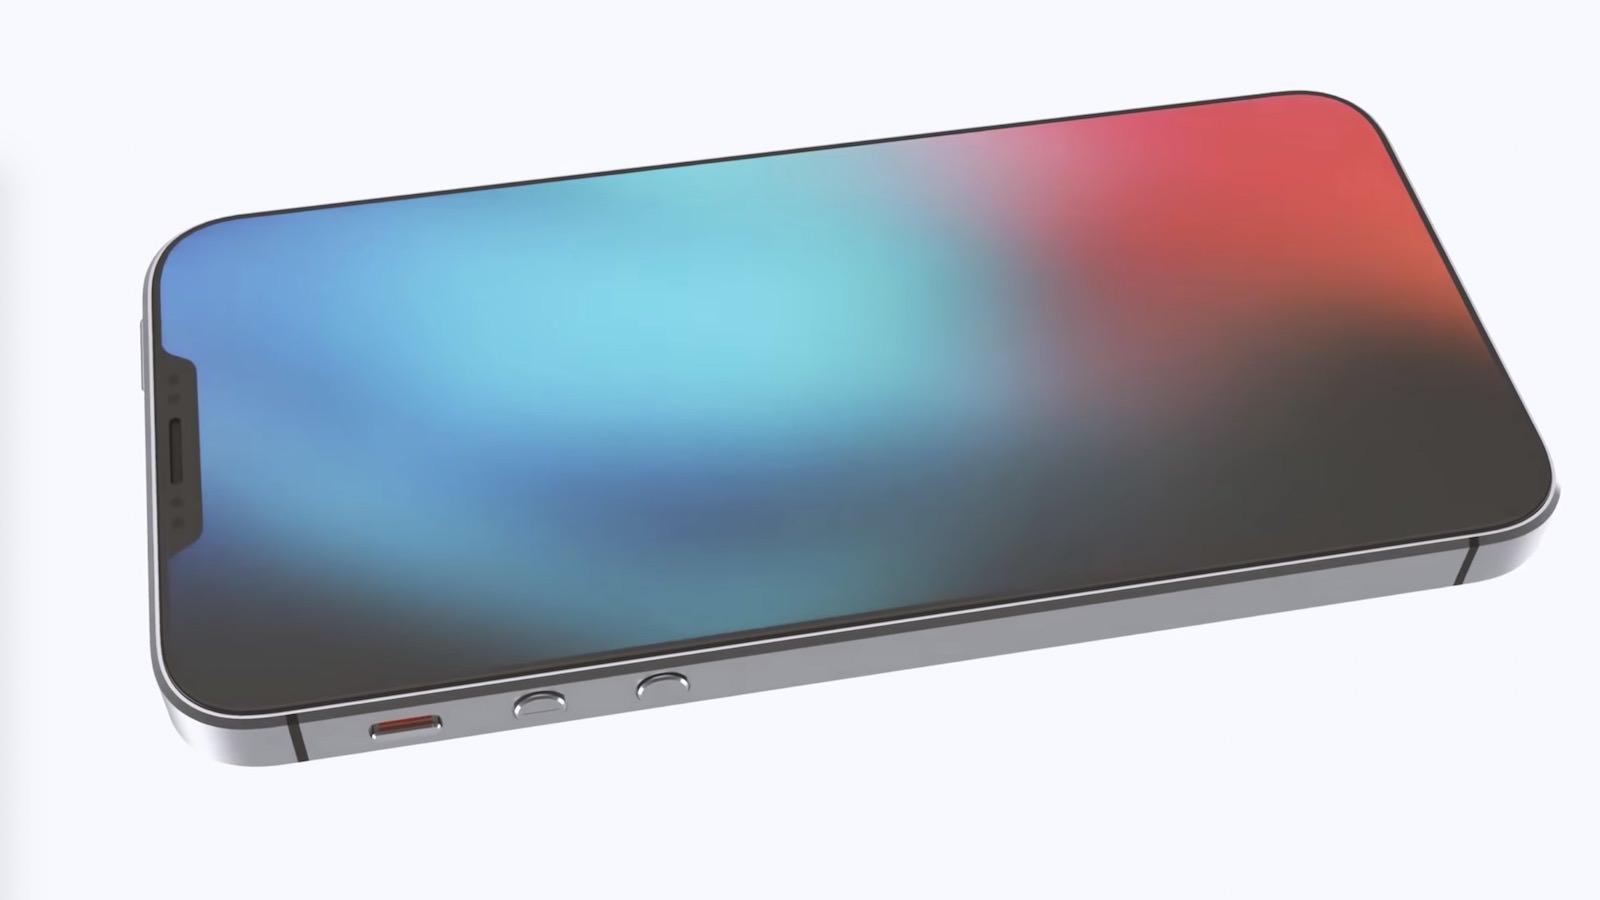 iphone-se2-concept-1.jpg